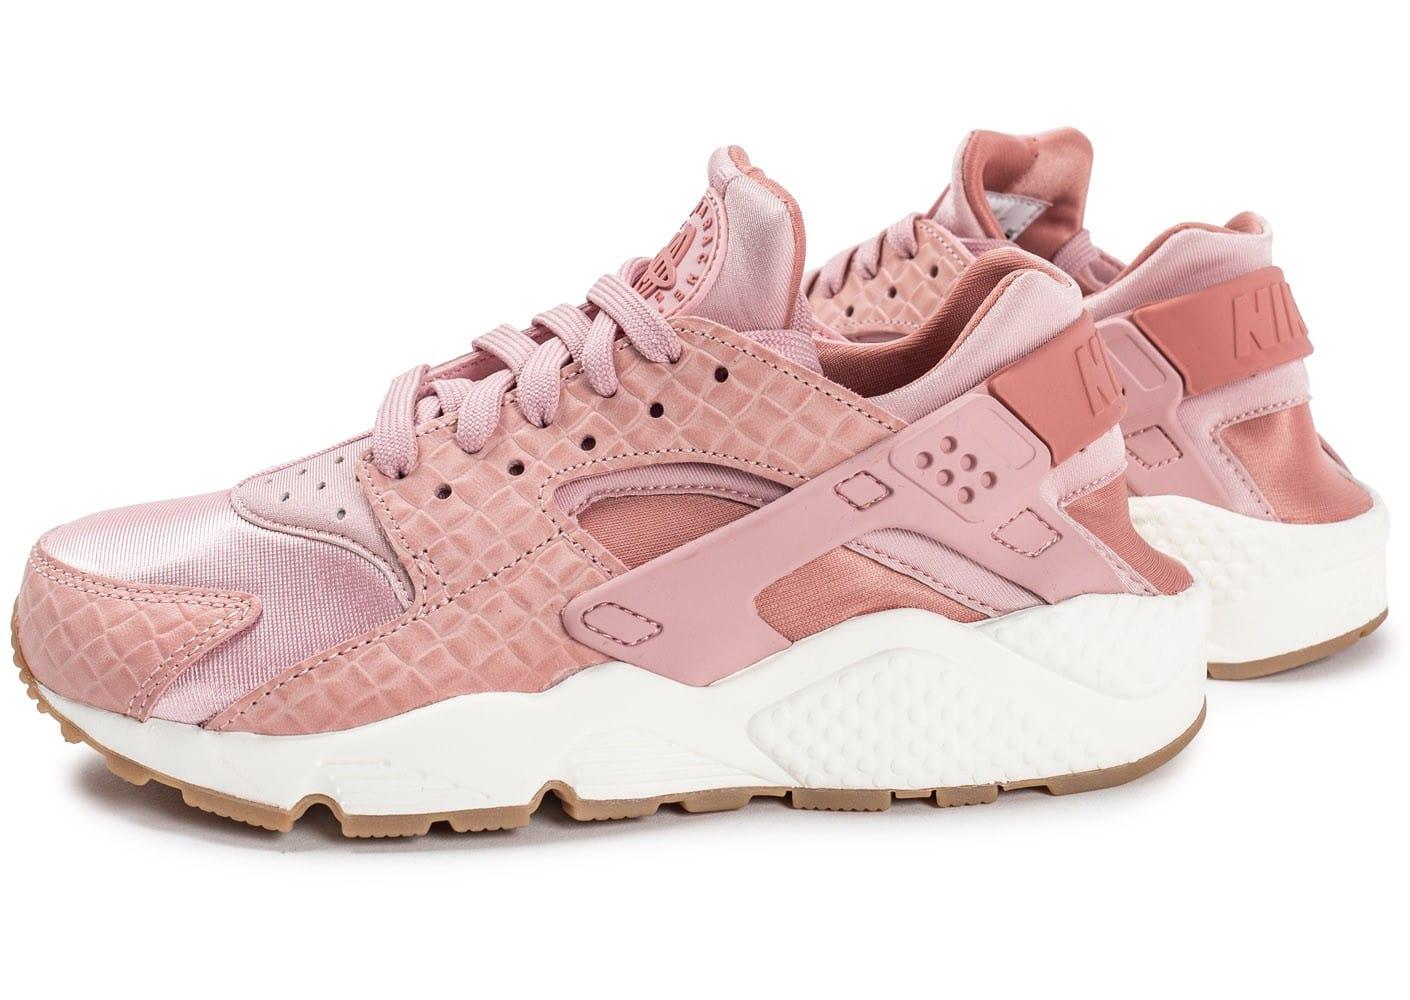 bas prix 56518 d60f6 basket nike rose saumon,Soldes Nike Air Max Thea Femme Rose ...